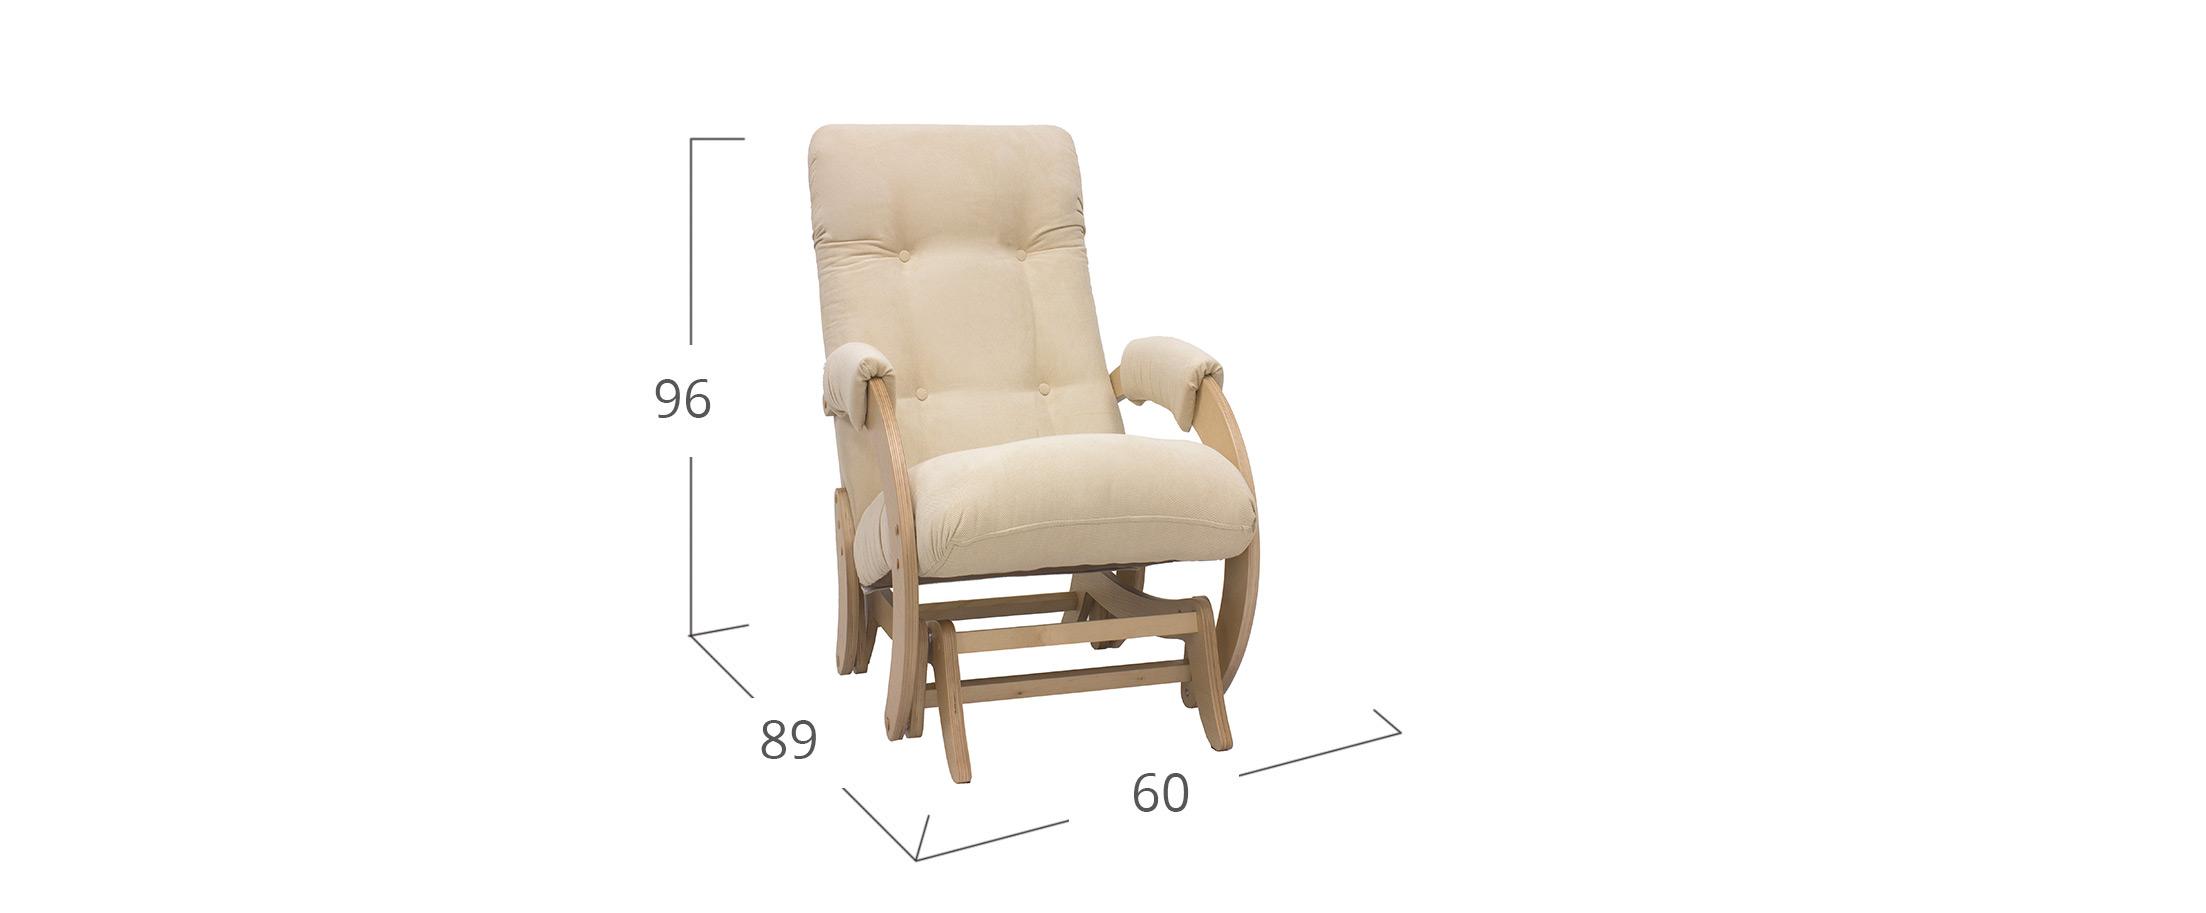 Кресло-гляйдер 68 Verona Vanilla Natural